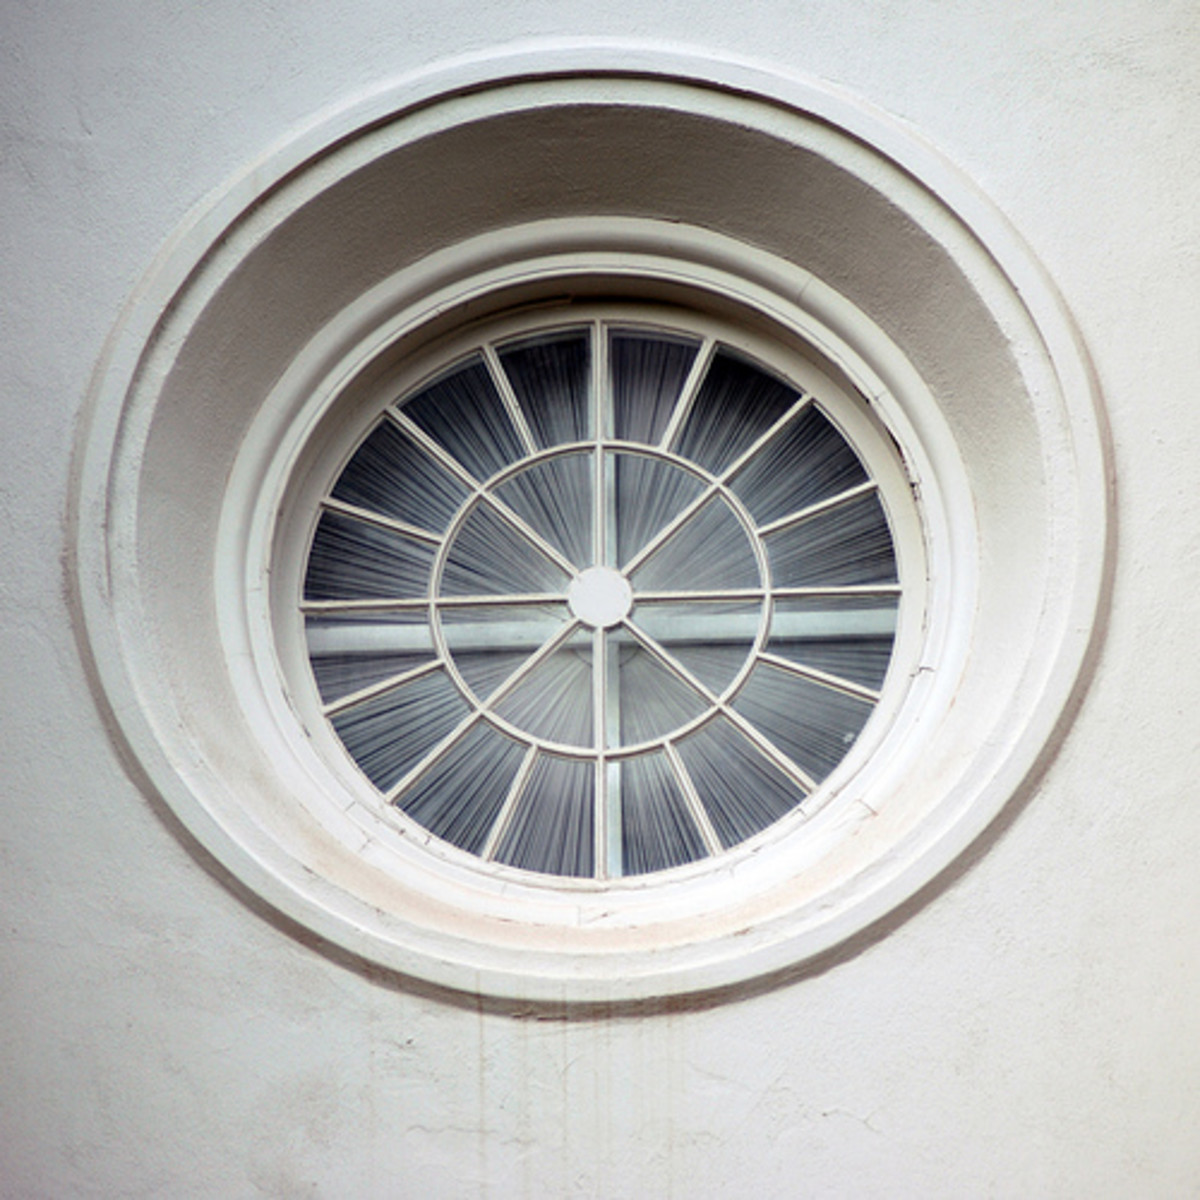 Shirred sunburst treatment on round window.